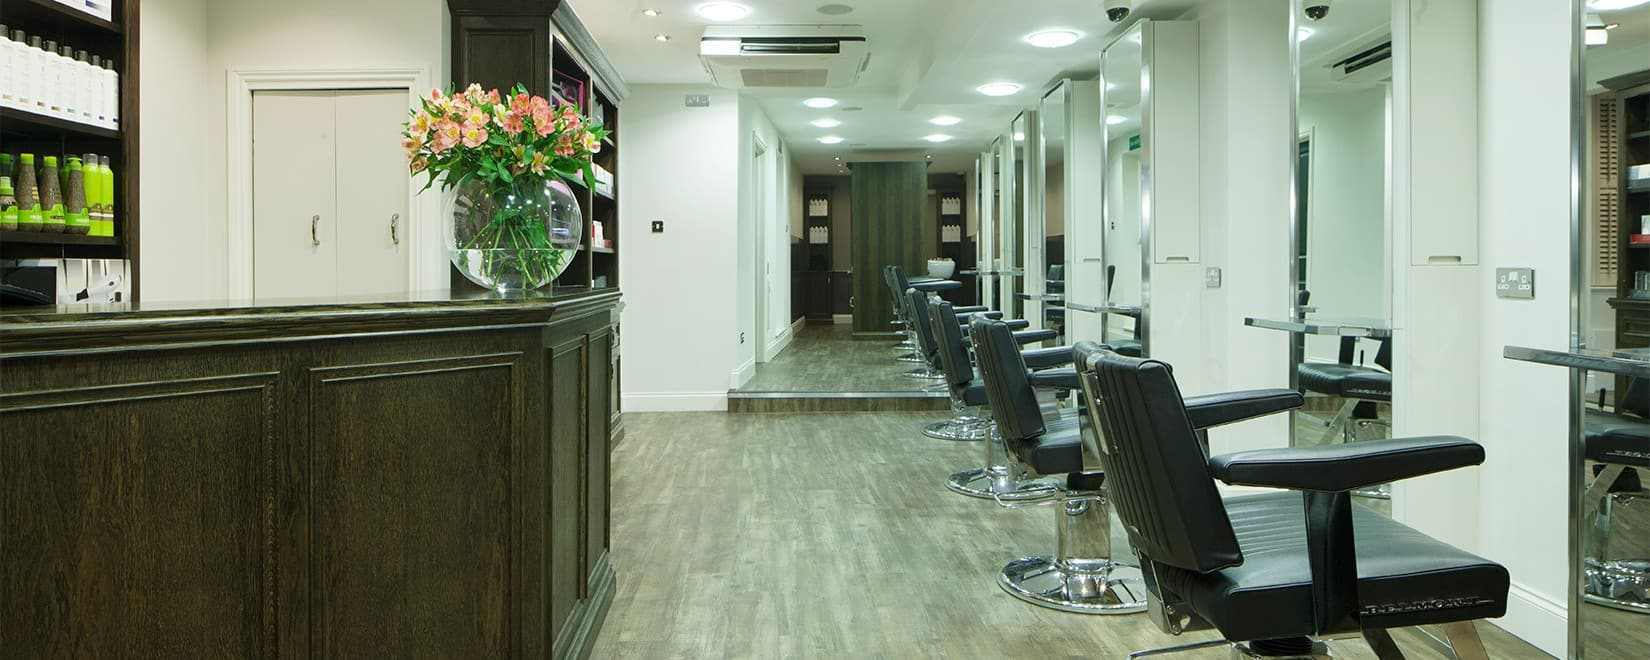 M Salons - Hairdressers Bishops Stortford - Interior Shop